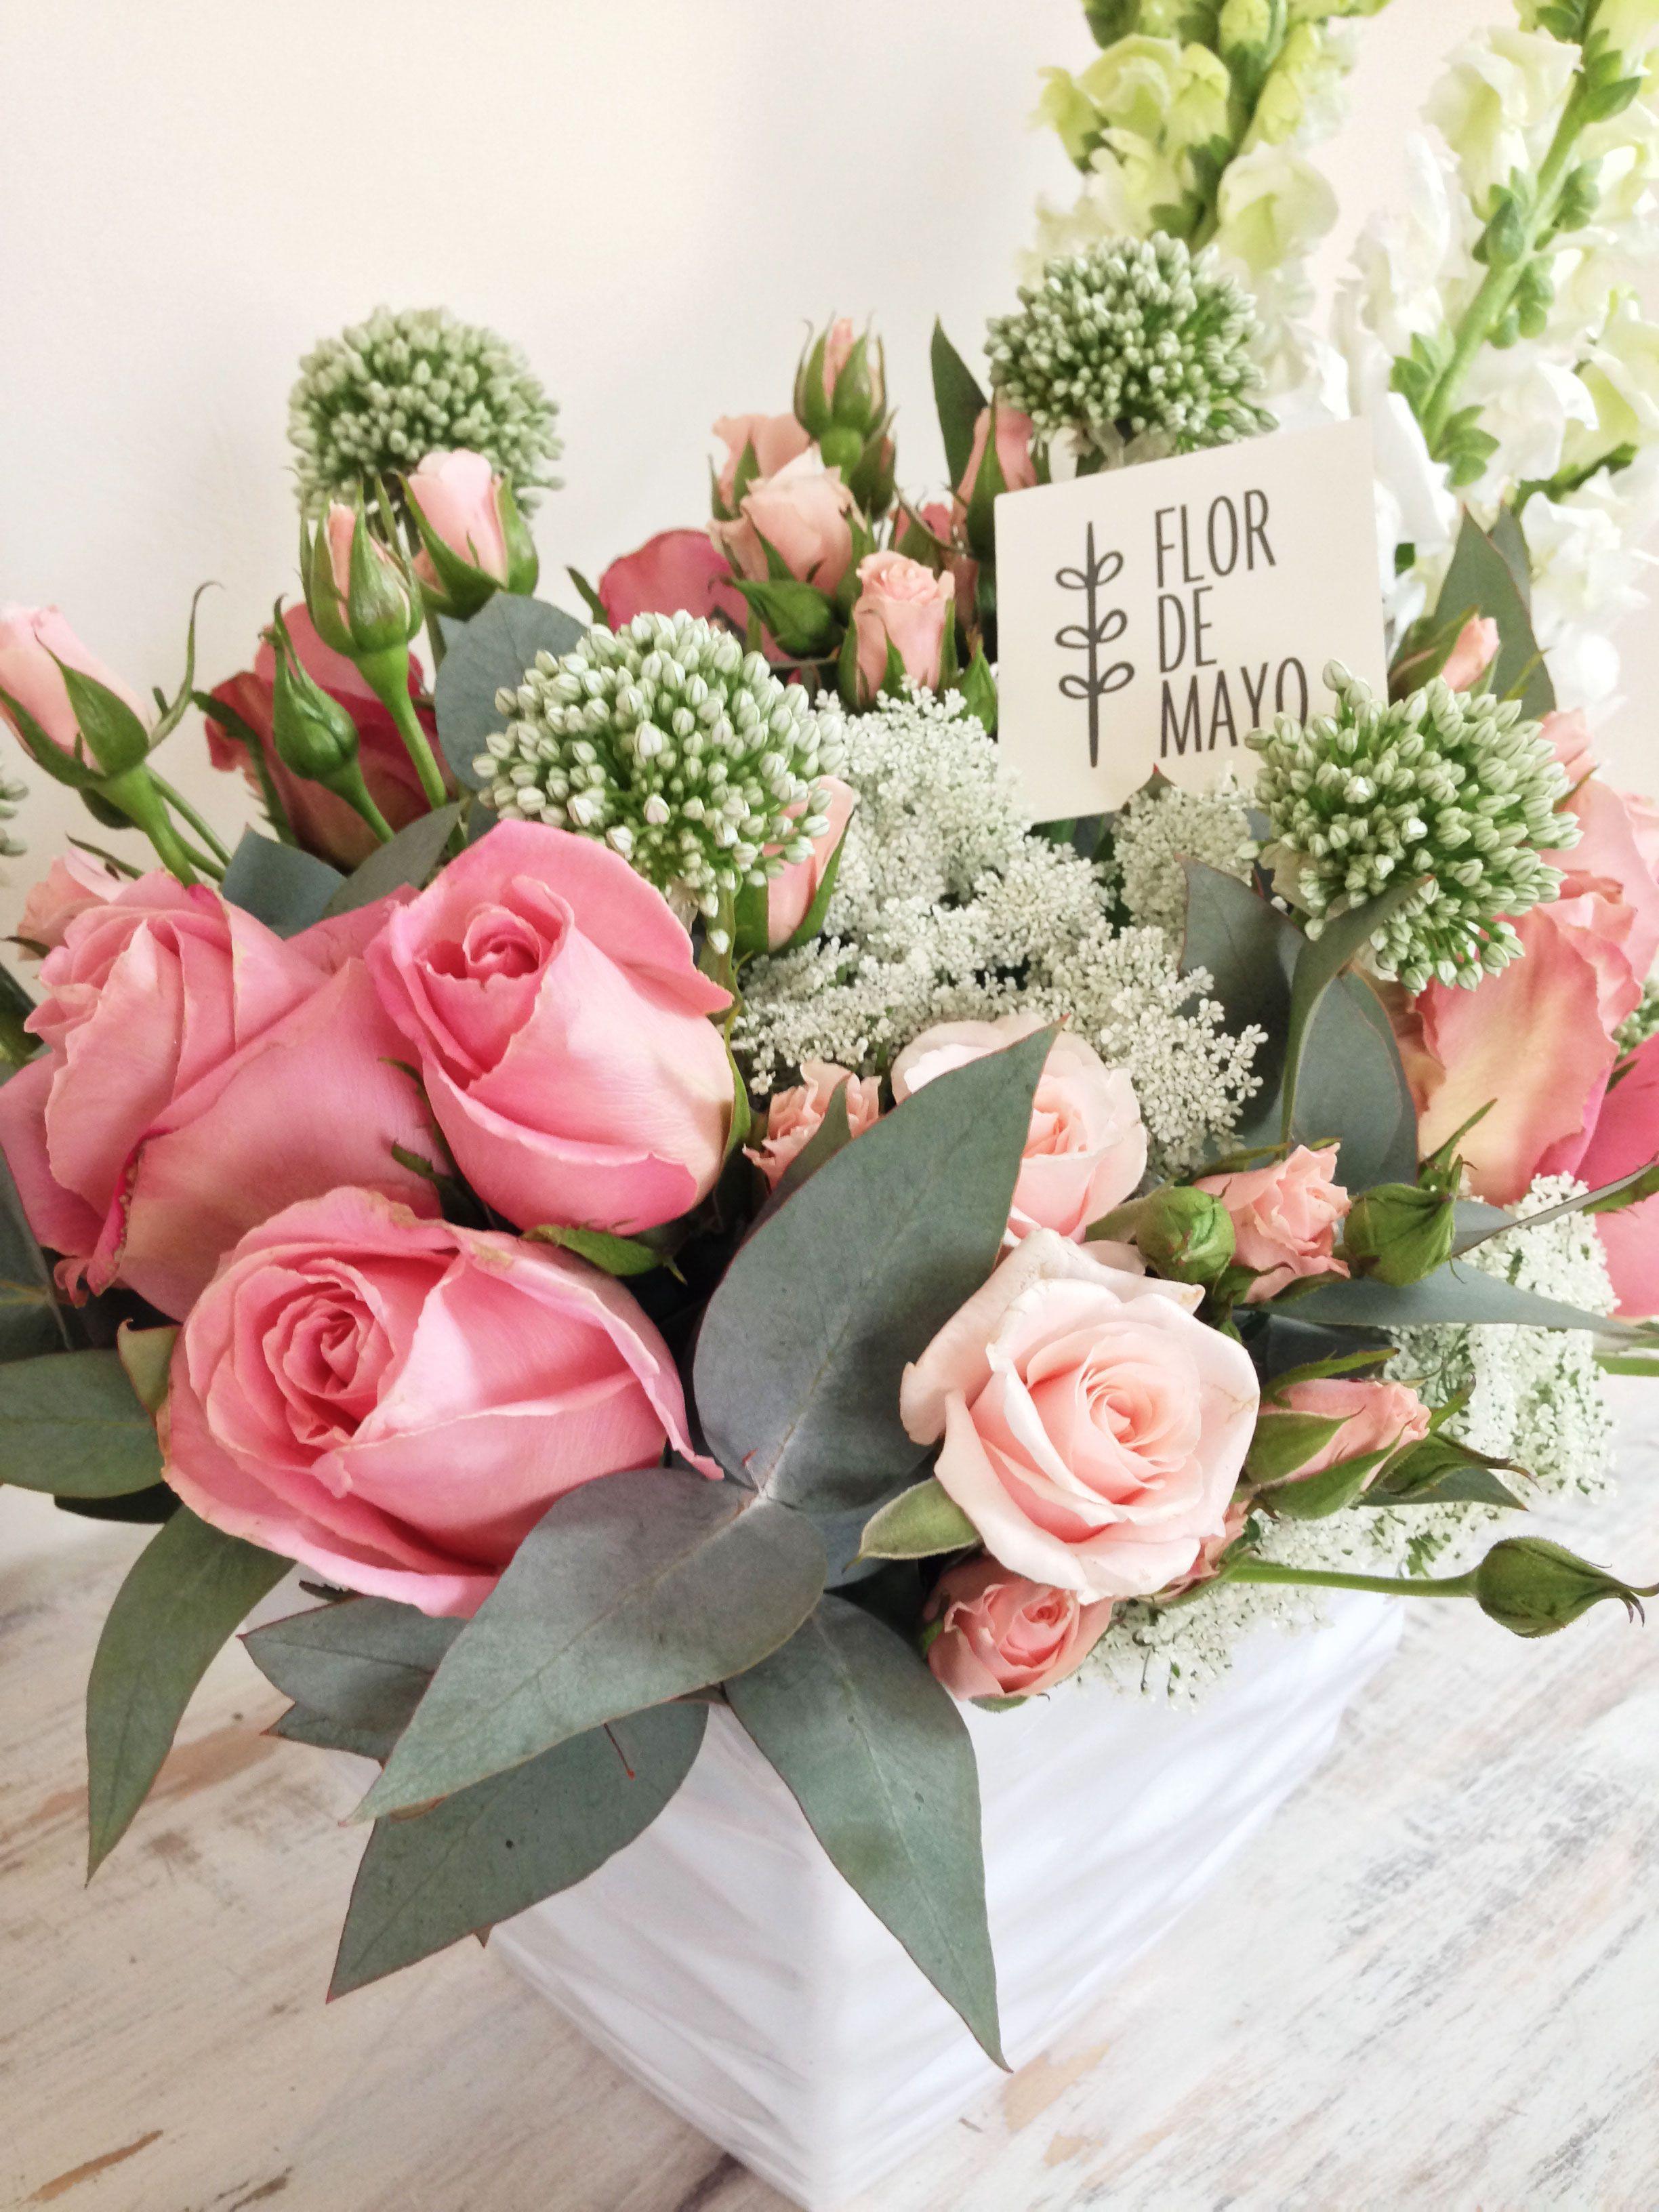 #babyshower #babygirl #pinkflowers #cute #sweet #showergift #eos #baby #pink #flordemayo